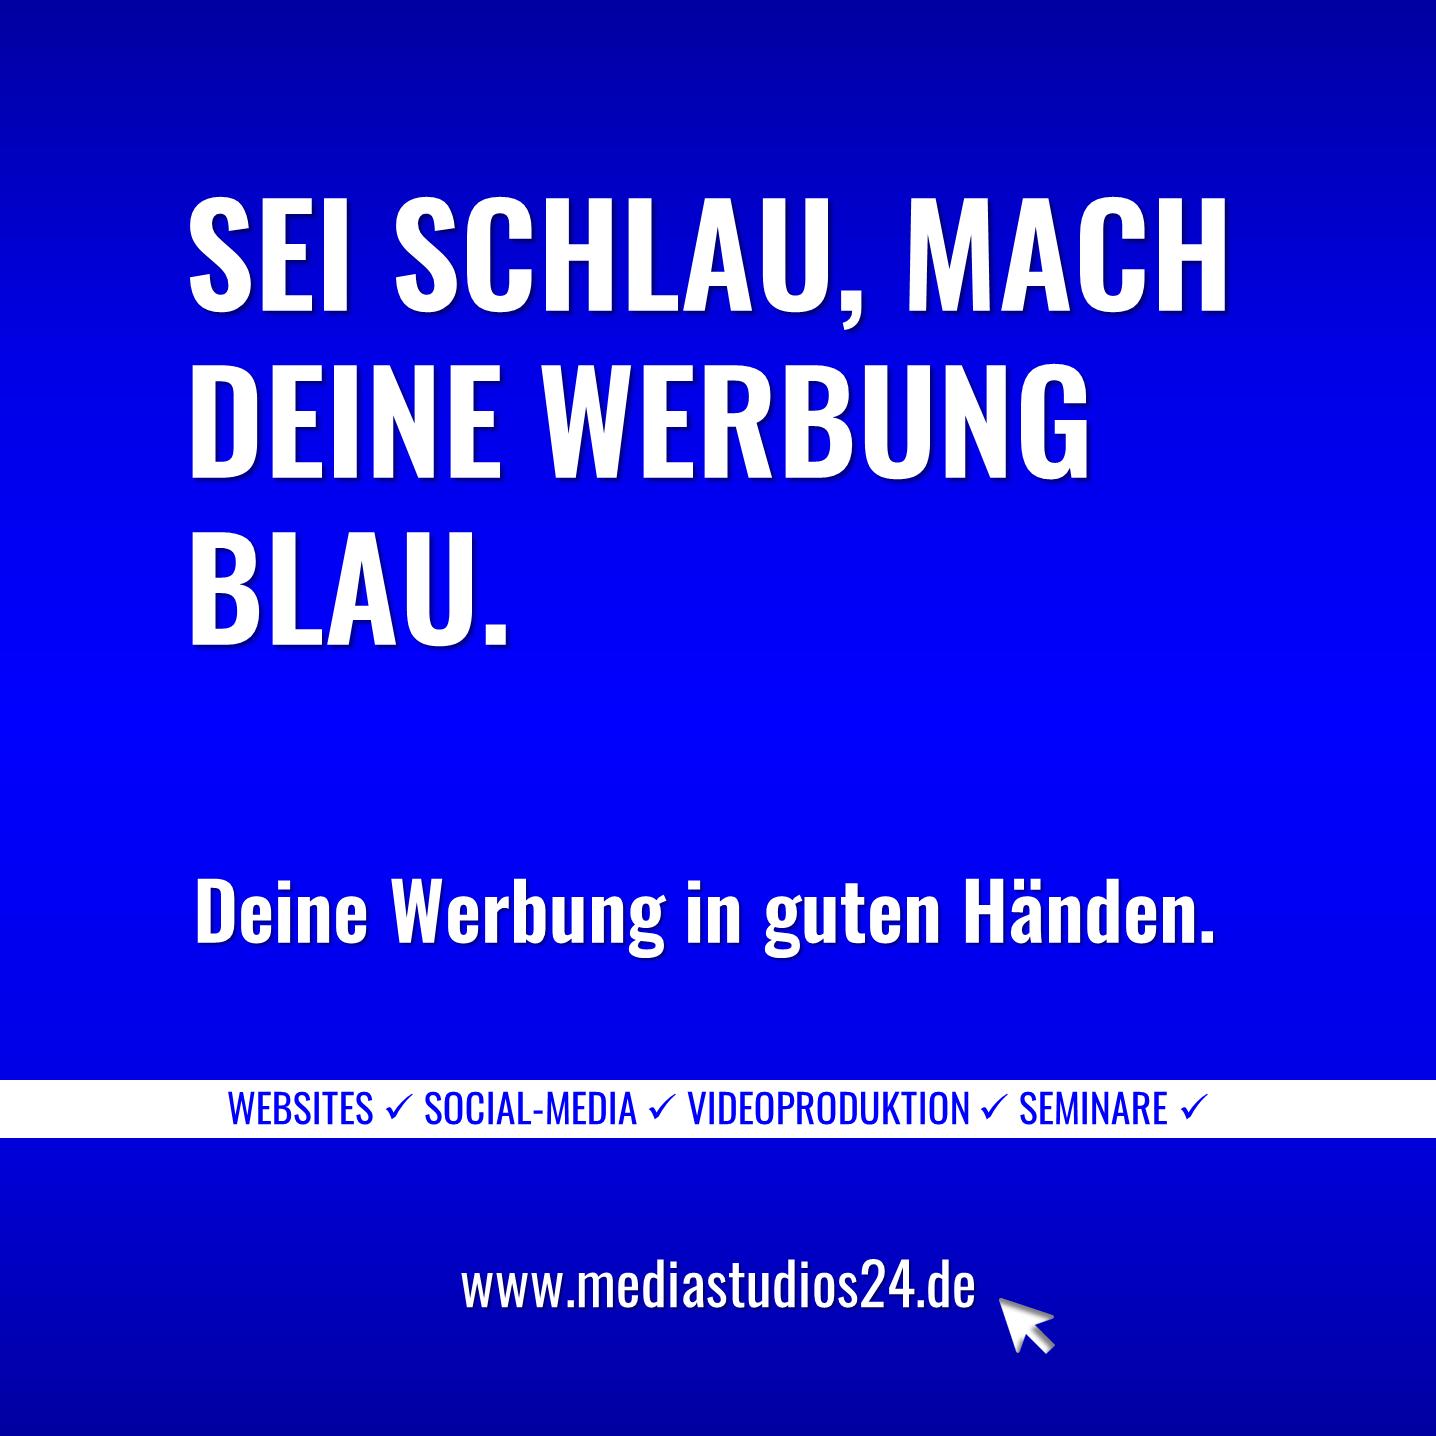 Gieseke mediastudios24